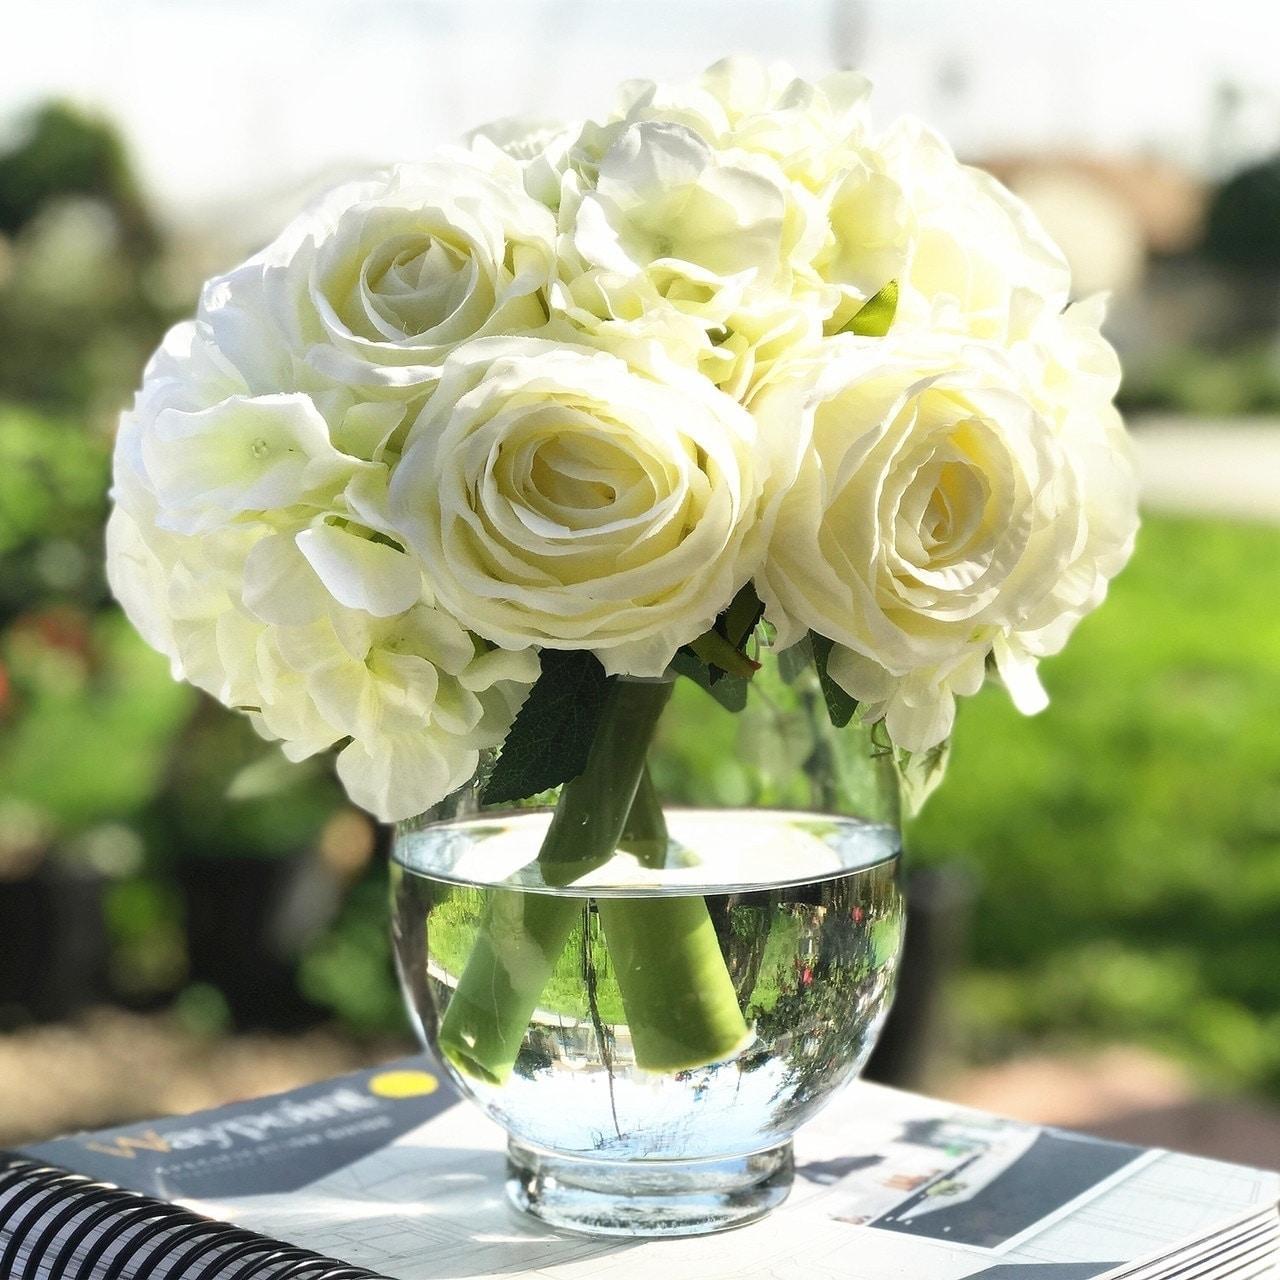 Enova Home Cream Artificial Silk Rose And Hydrangea Flower Arrangements With Gl Vase